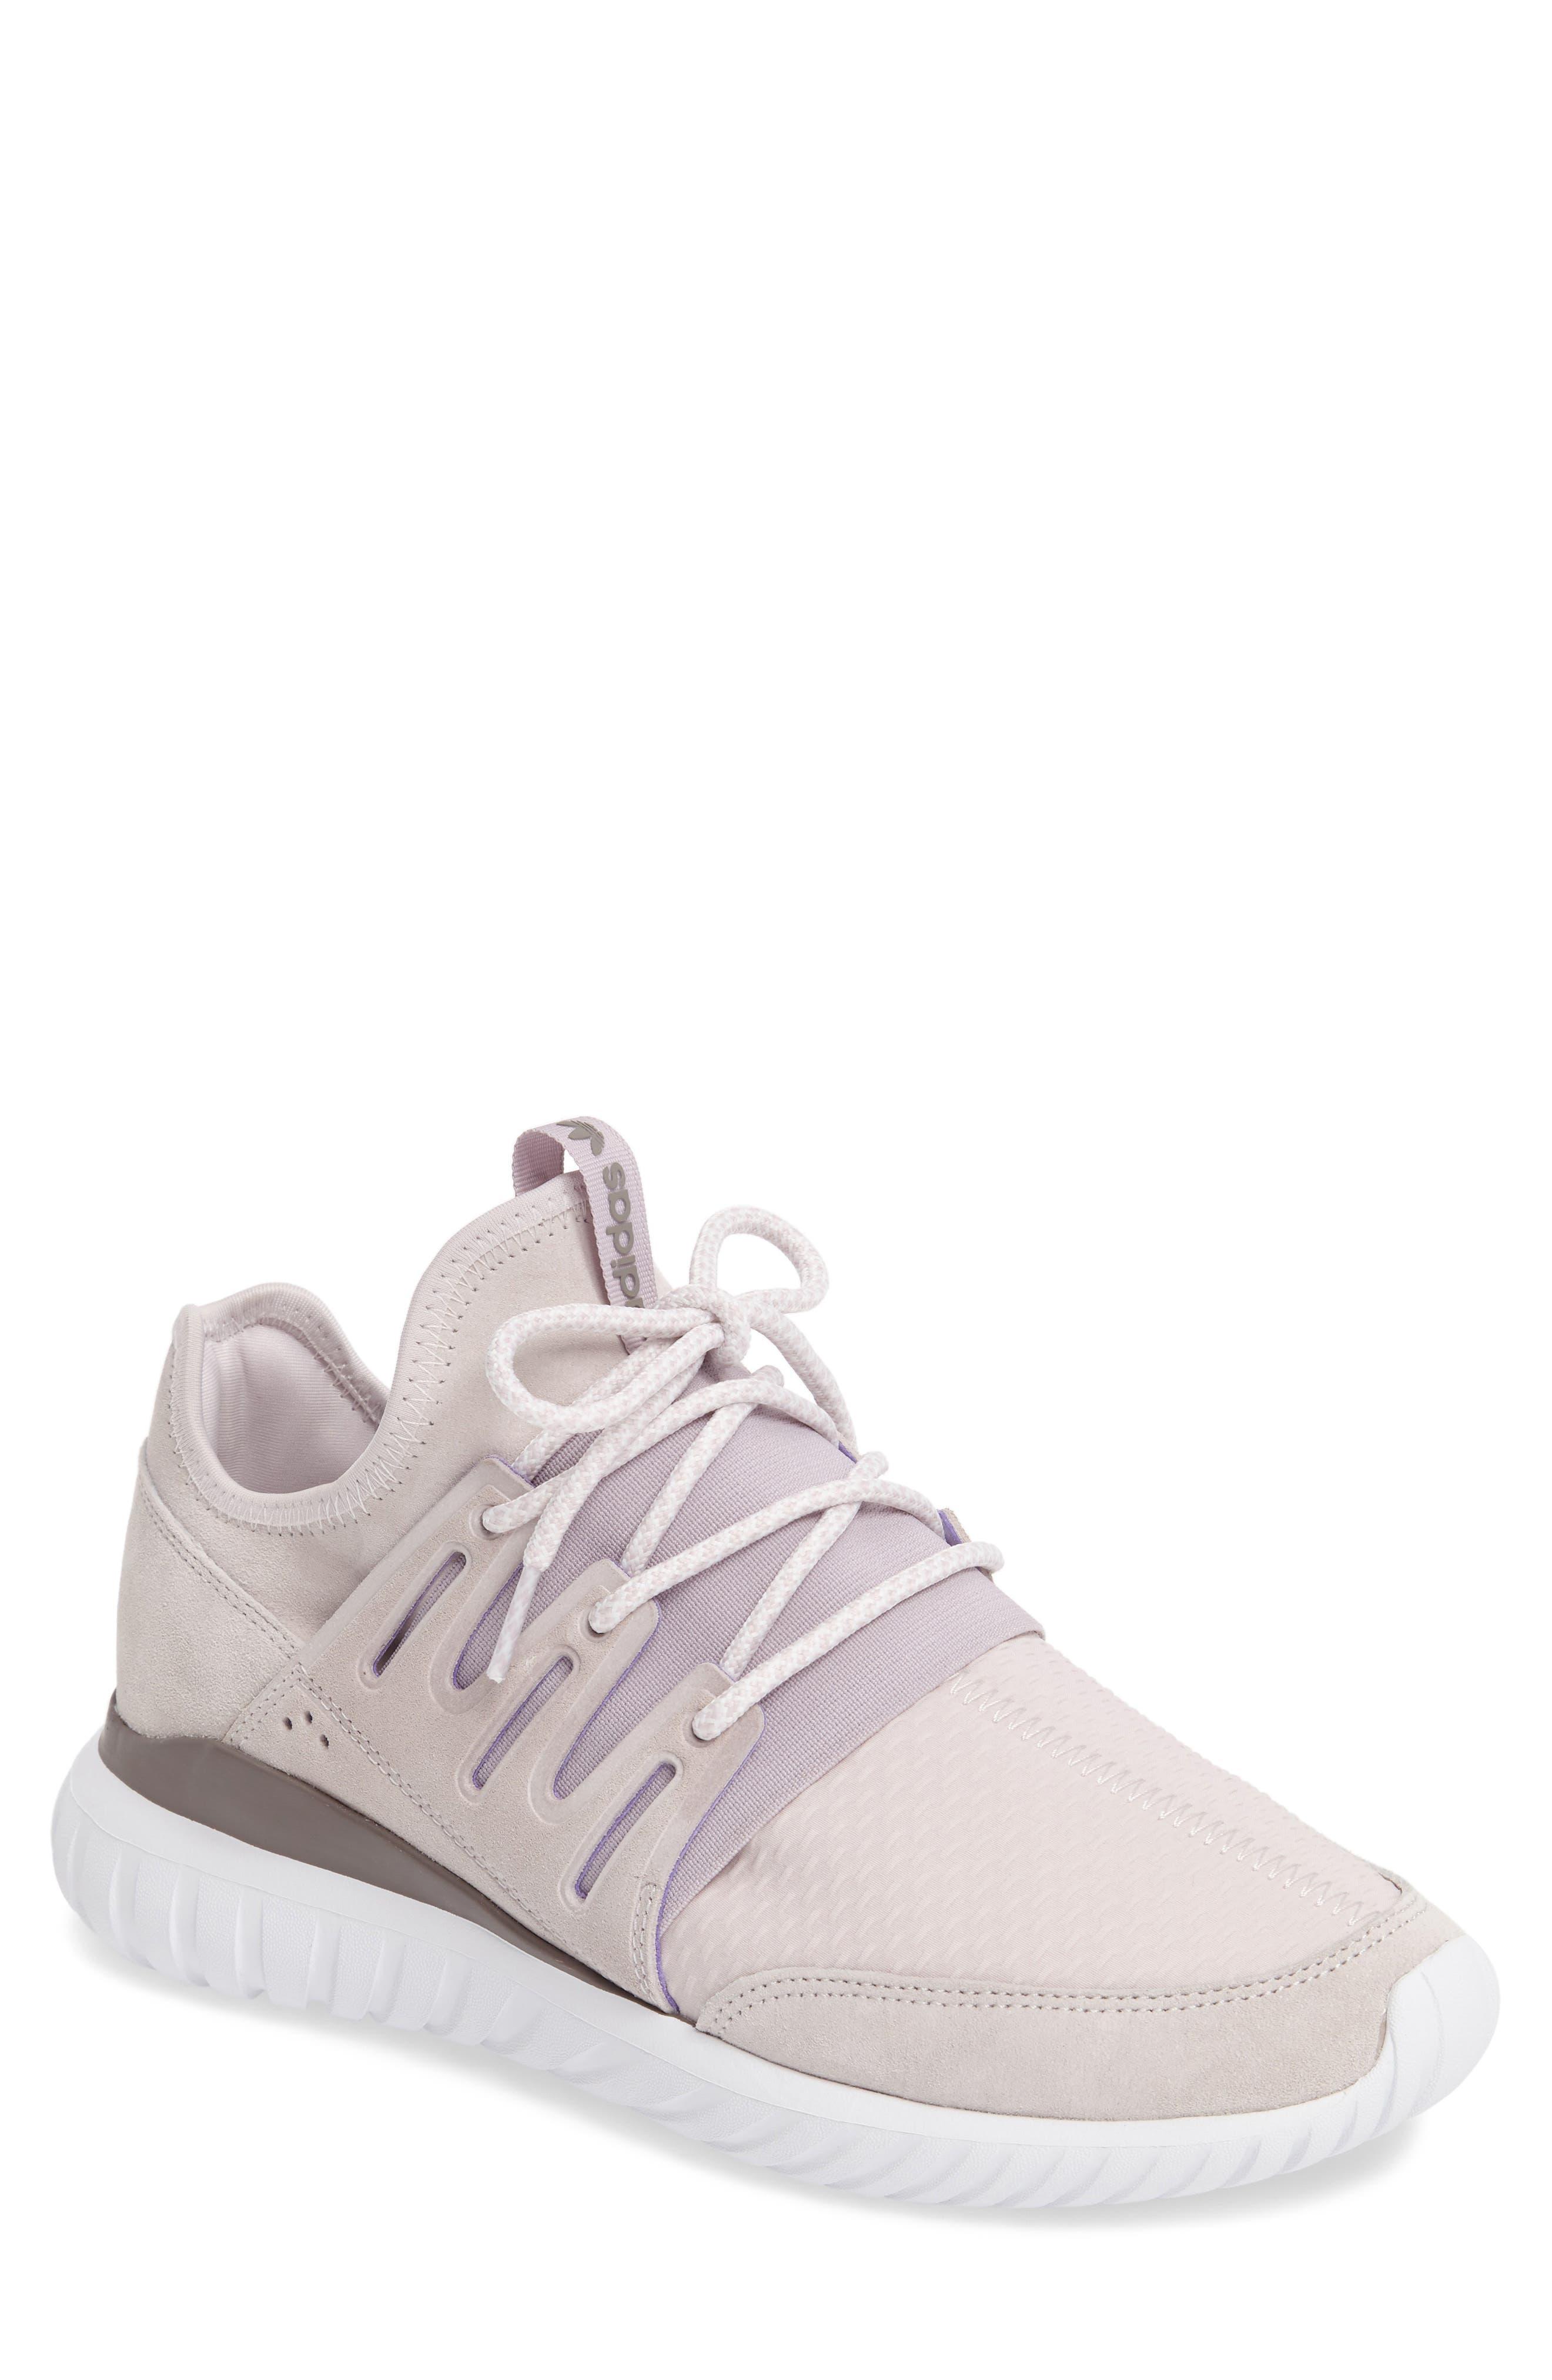 36e6f49276438 adidas tubular mens shoes on sale   OFF72% Discounts